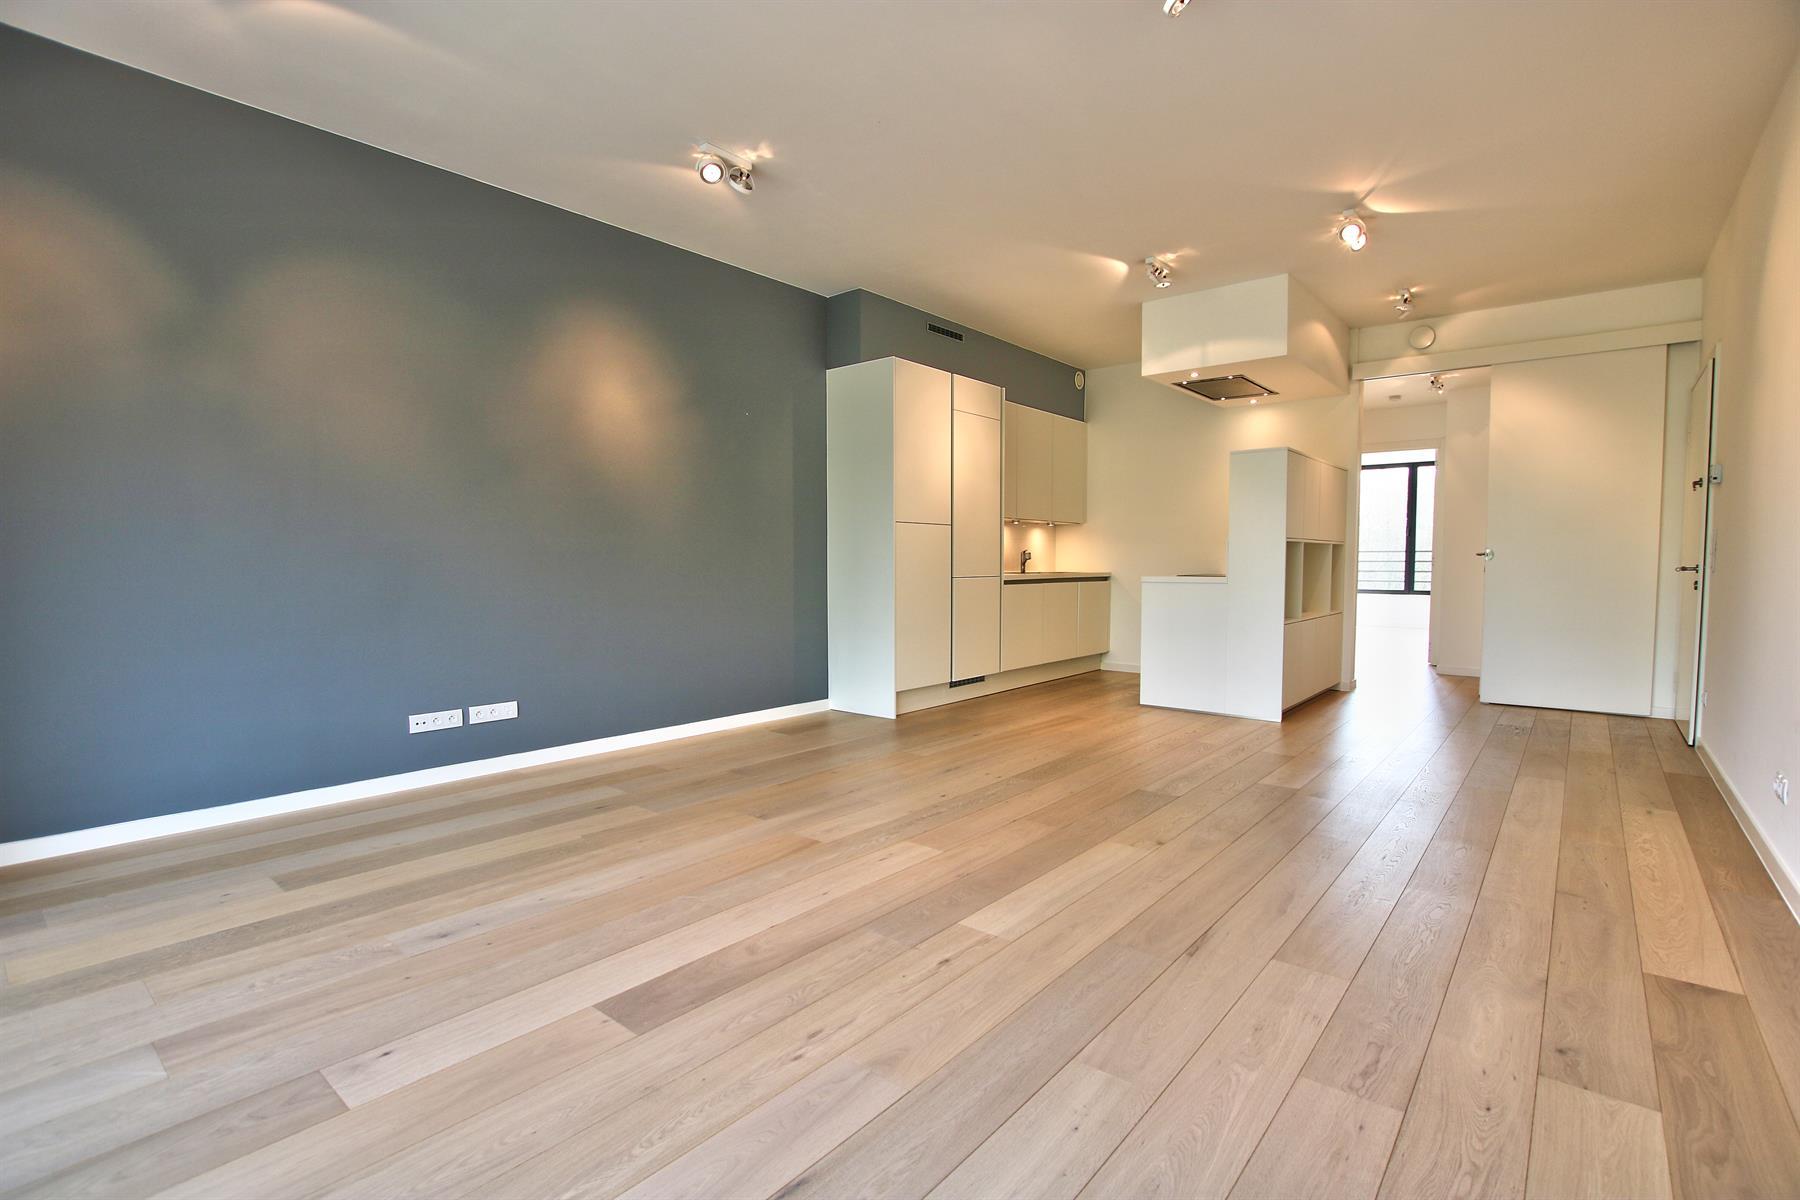 Appartement - Woluwe-Saint-Lambert - #4324368-13